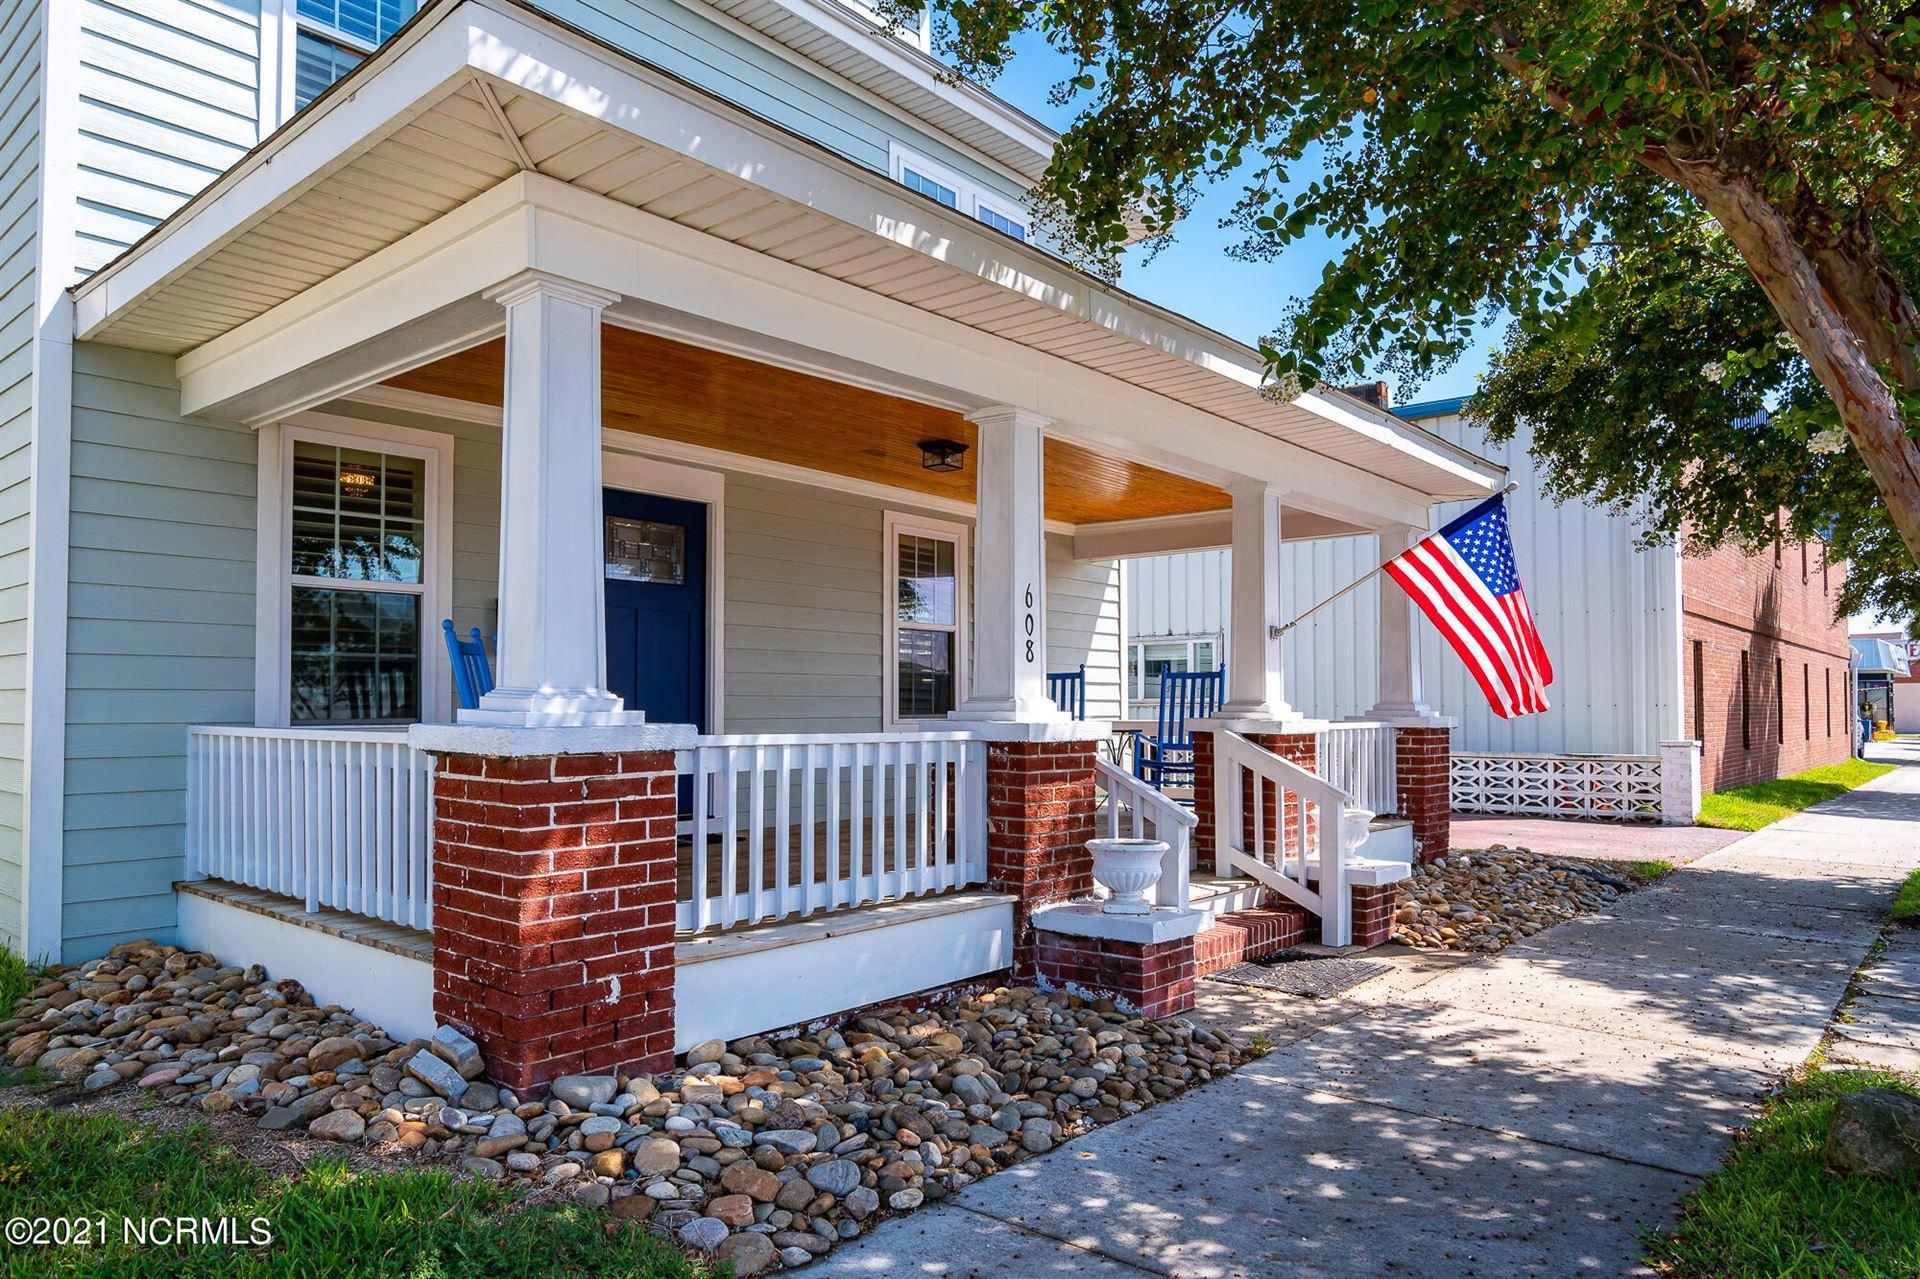 Photo of 608 Arendell Street, Morehead City, NC 28557 (MLS # 100287151)